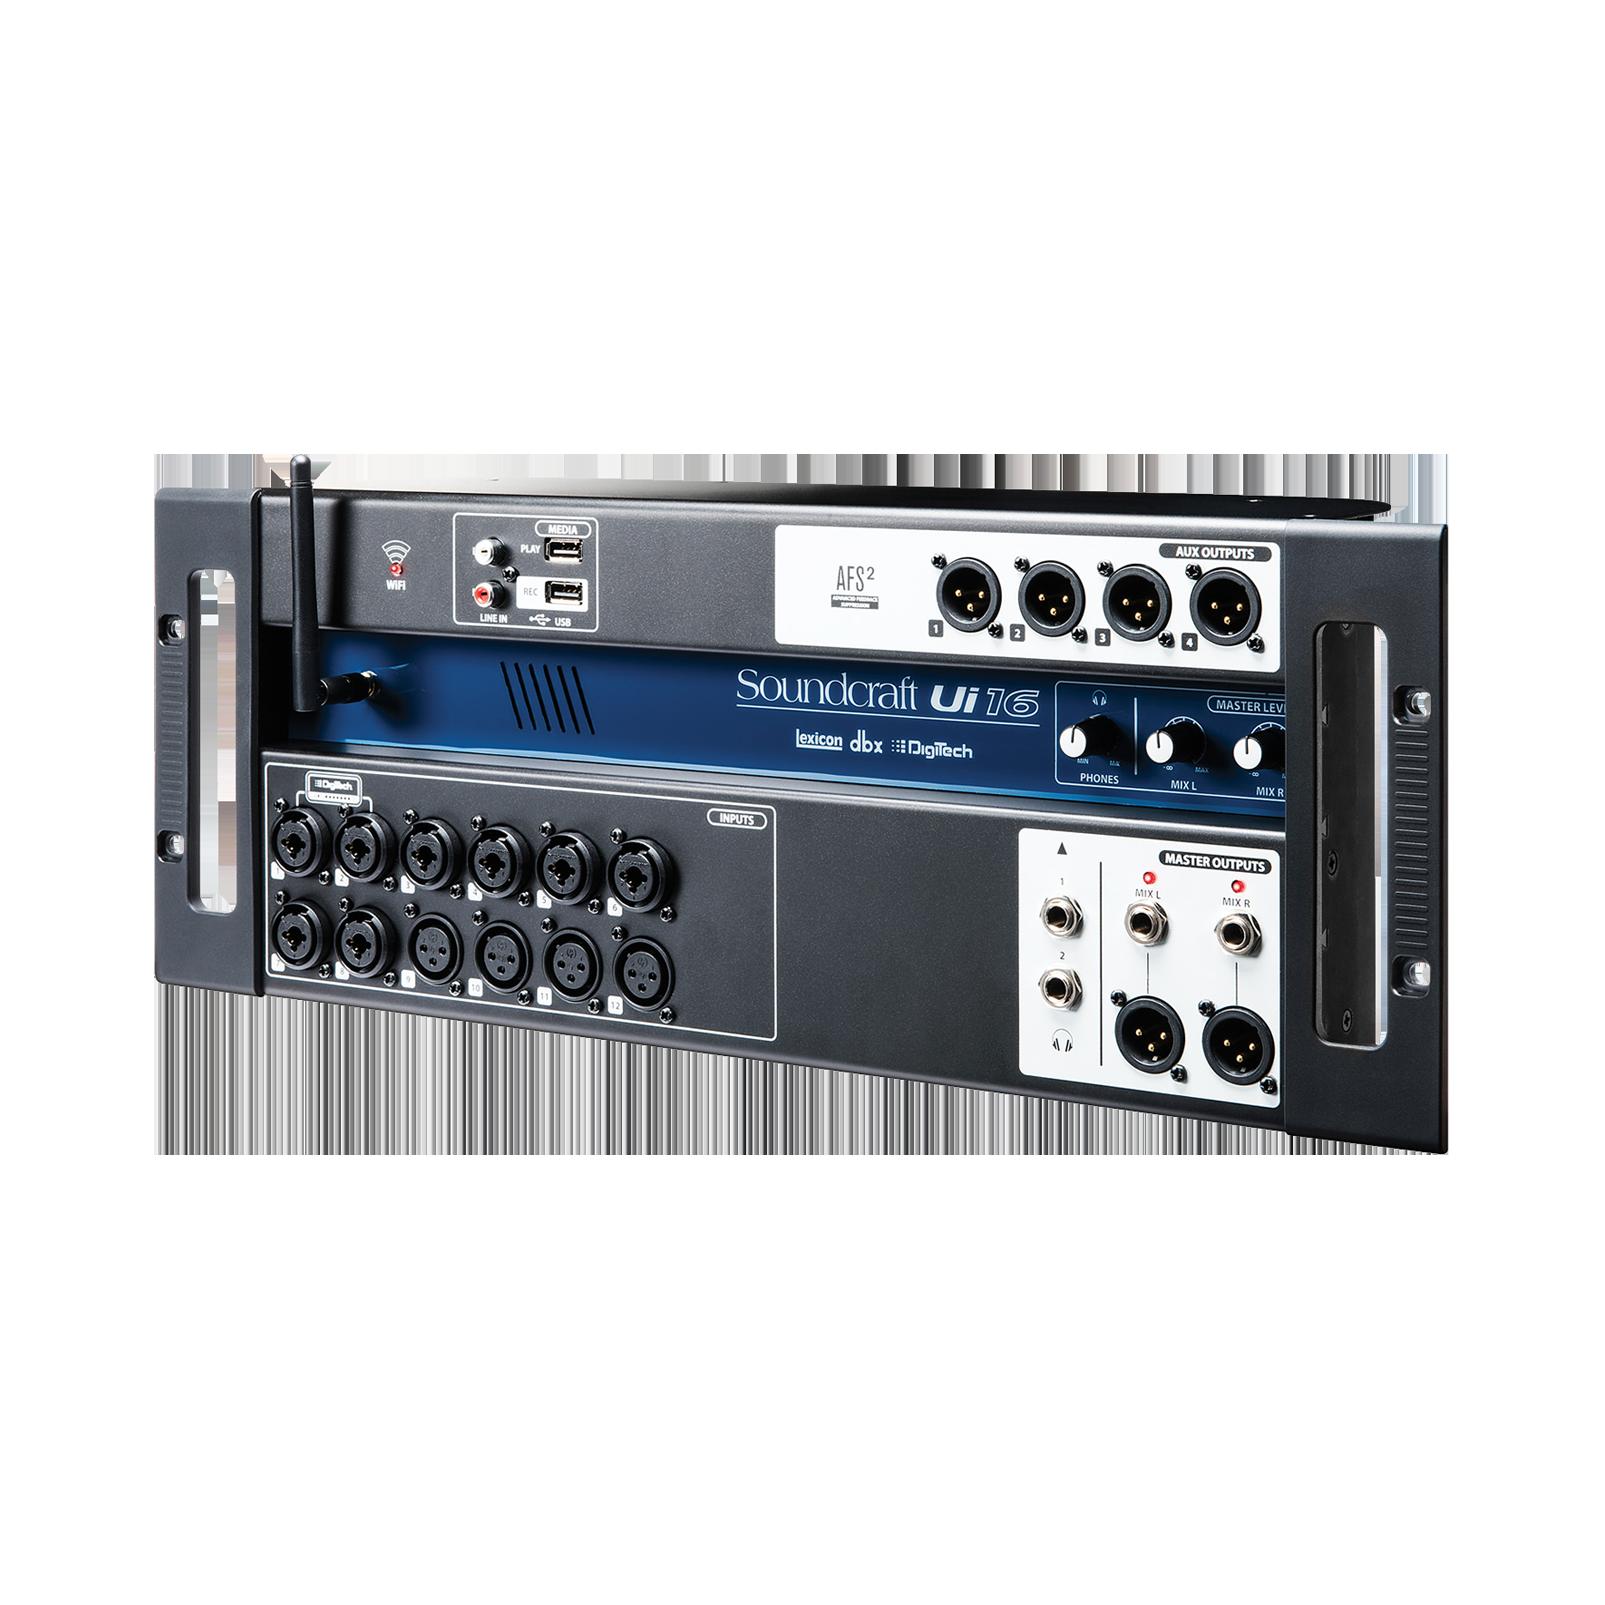 Ui16 - Black - 16-input remote-controlled digital mixer - Hero